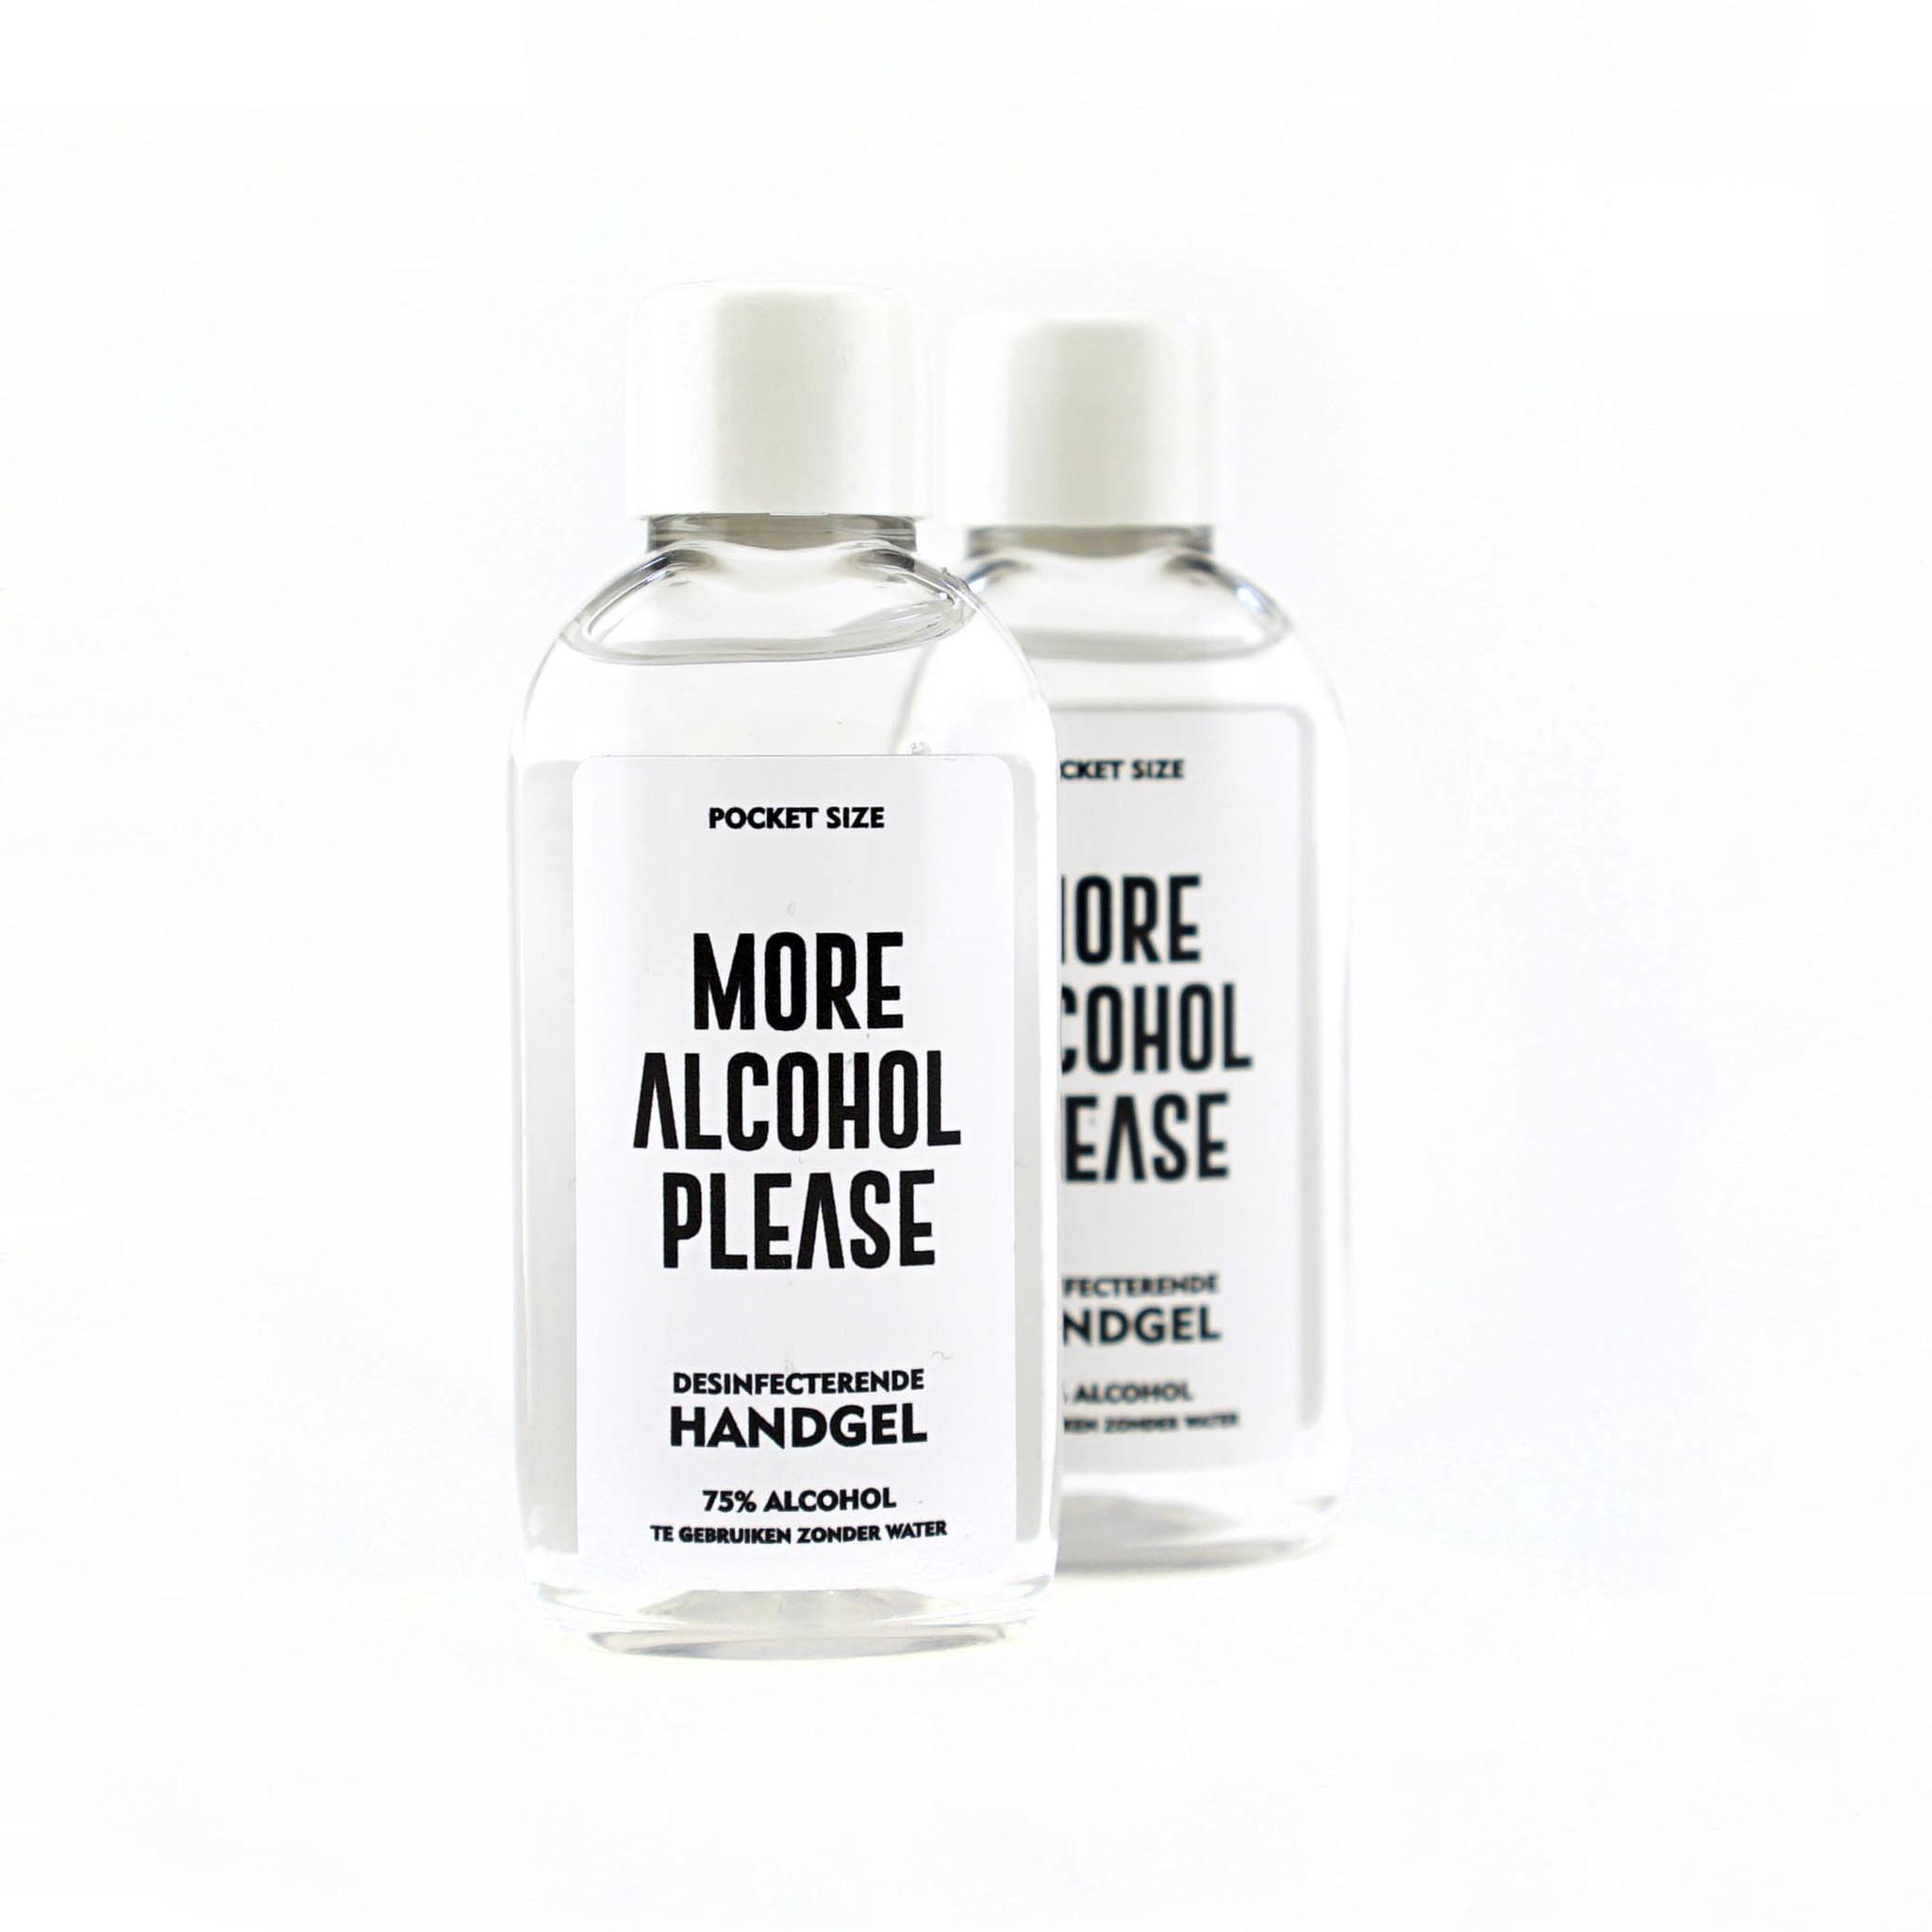 Topfanz Duopack alcoolgel de poche - More Alcohol Please